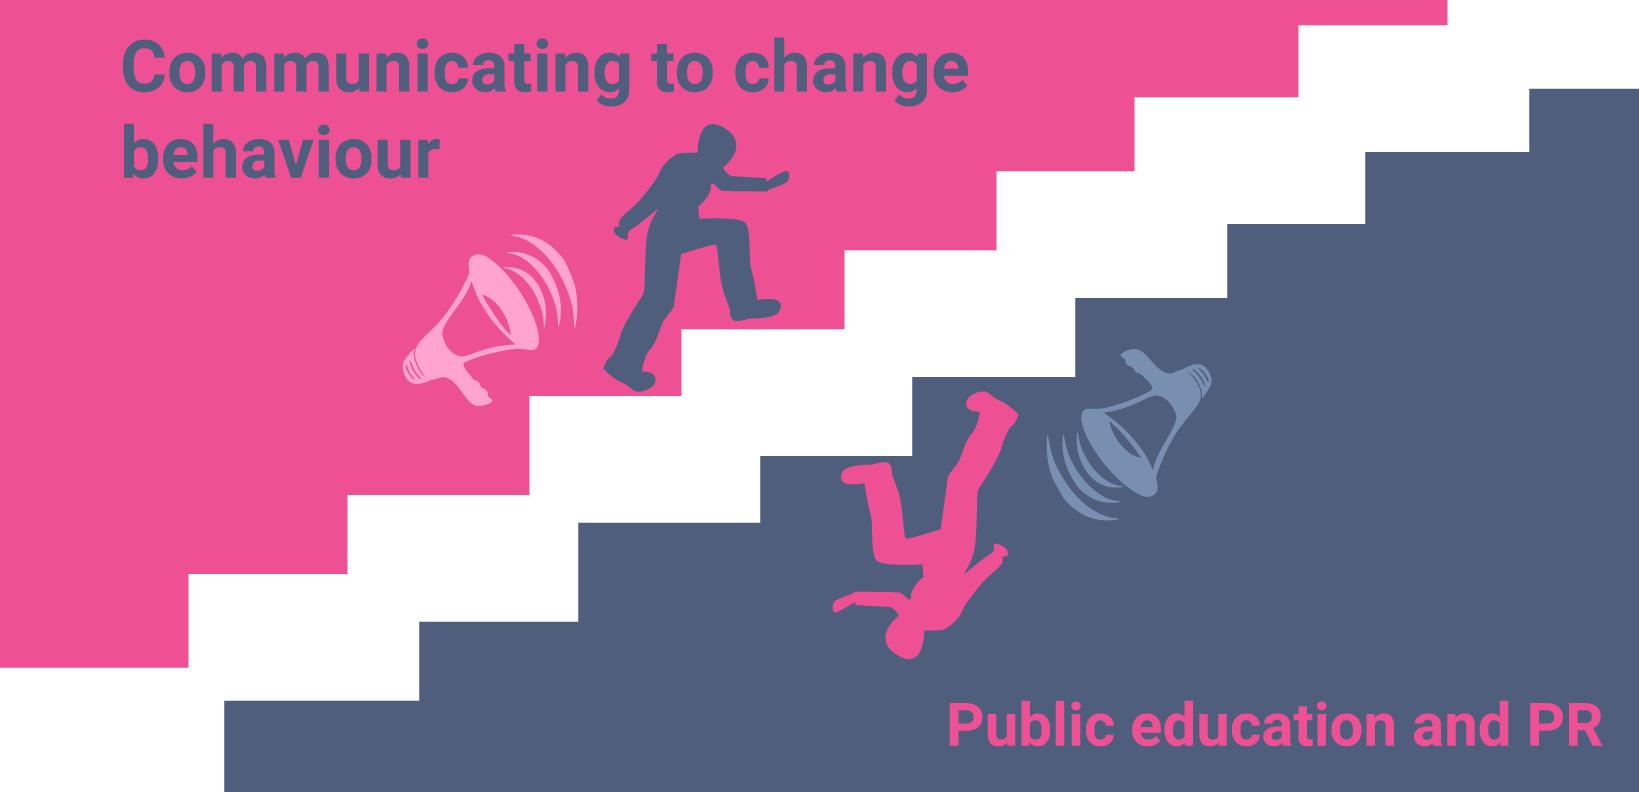 Communicating to Change Behaviour - Public Education and PR